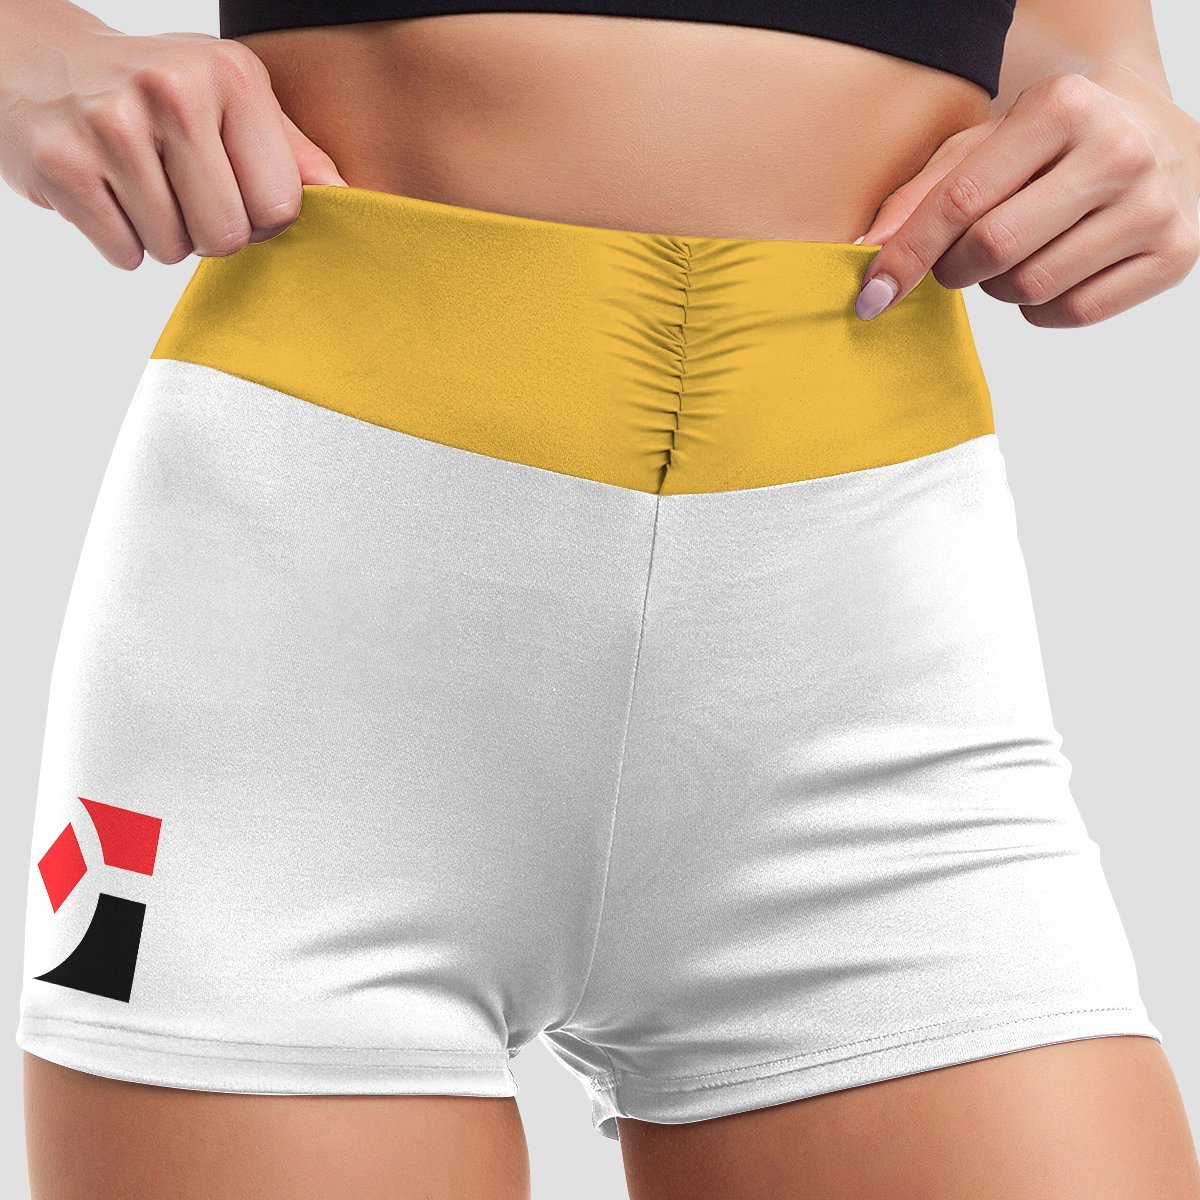 pokemon champion uniform active wear set 778227 - Anime Swimsuits